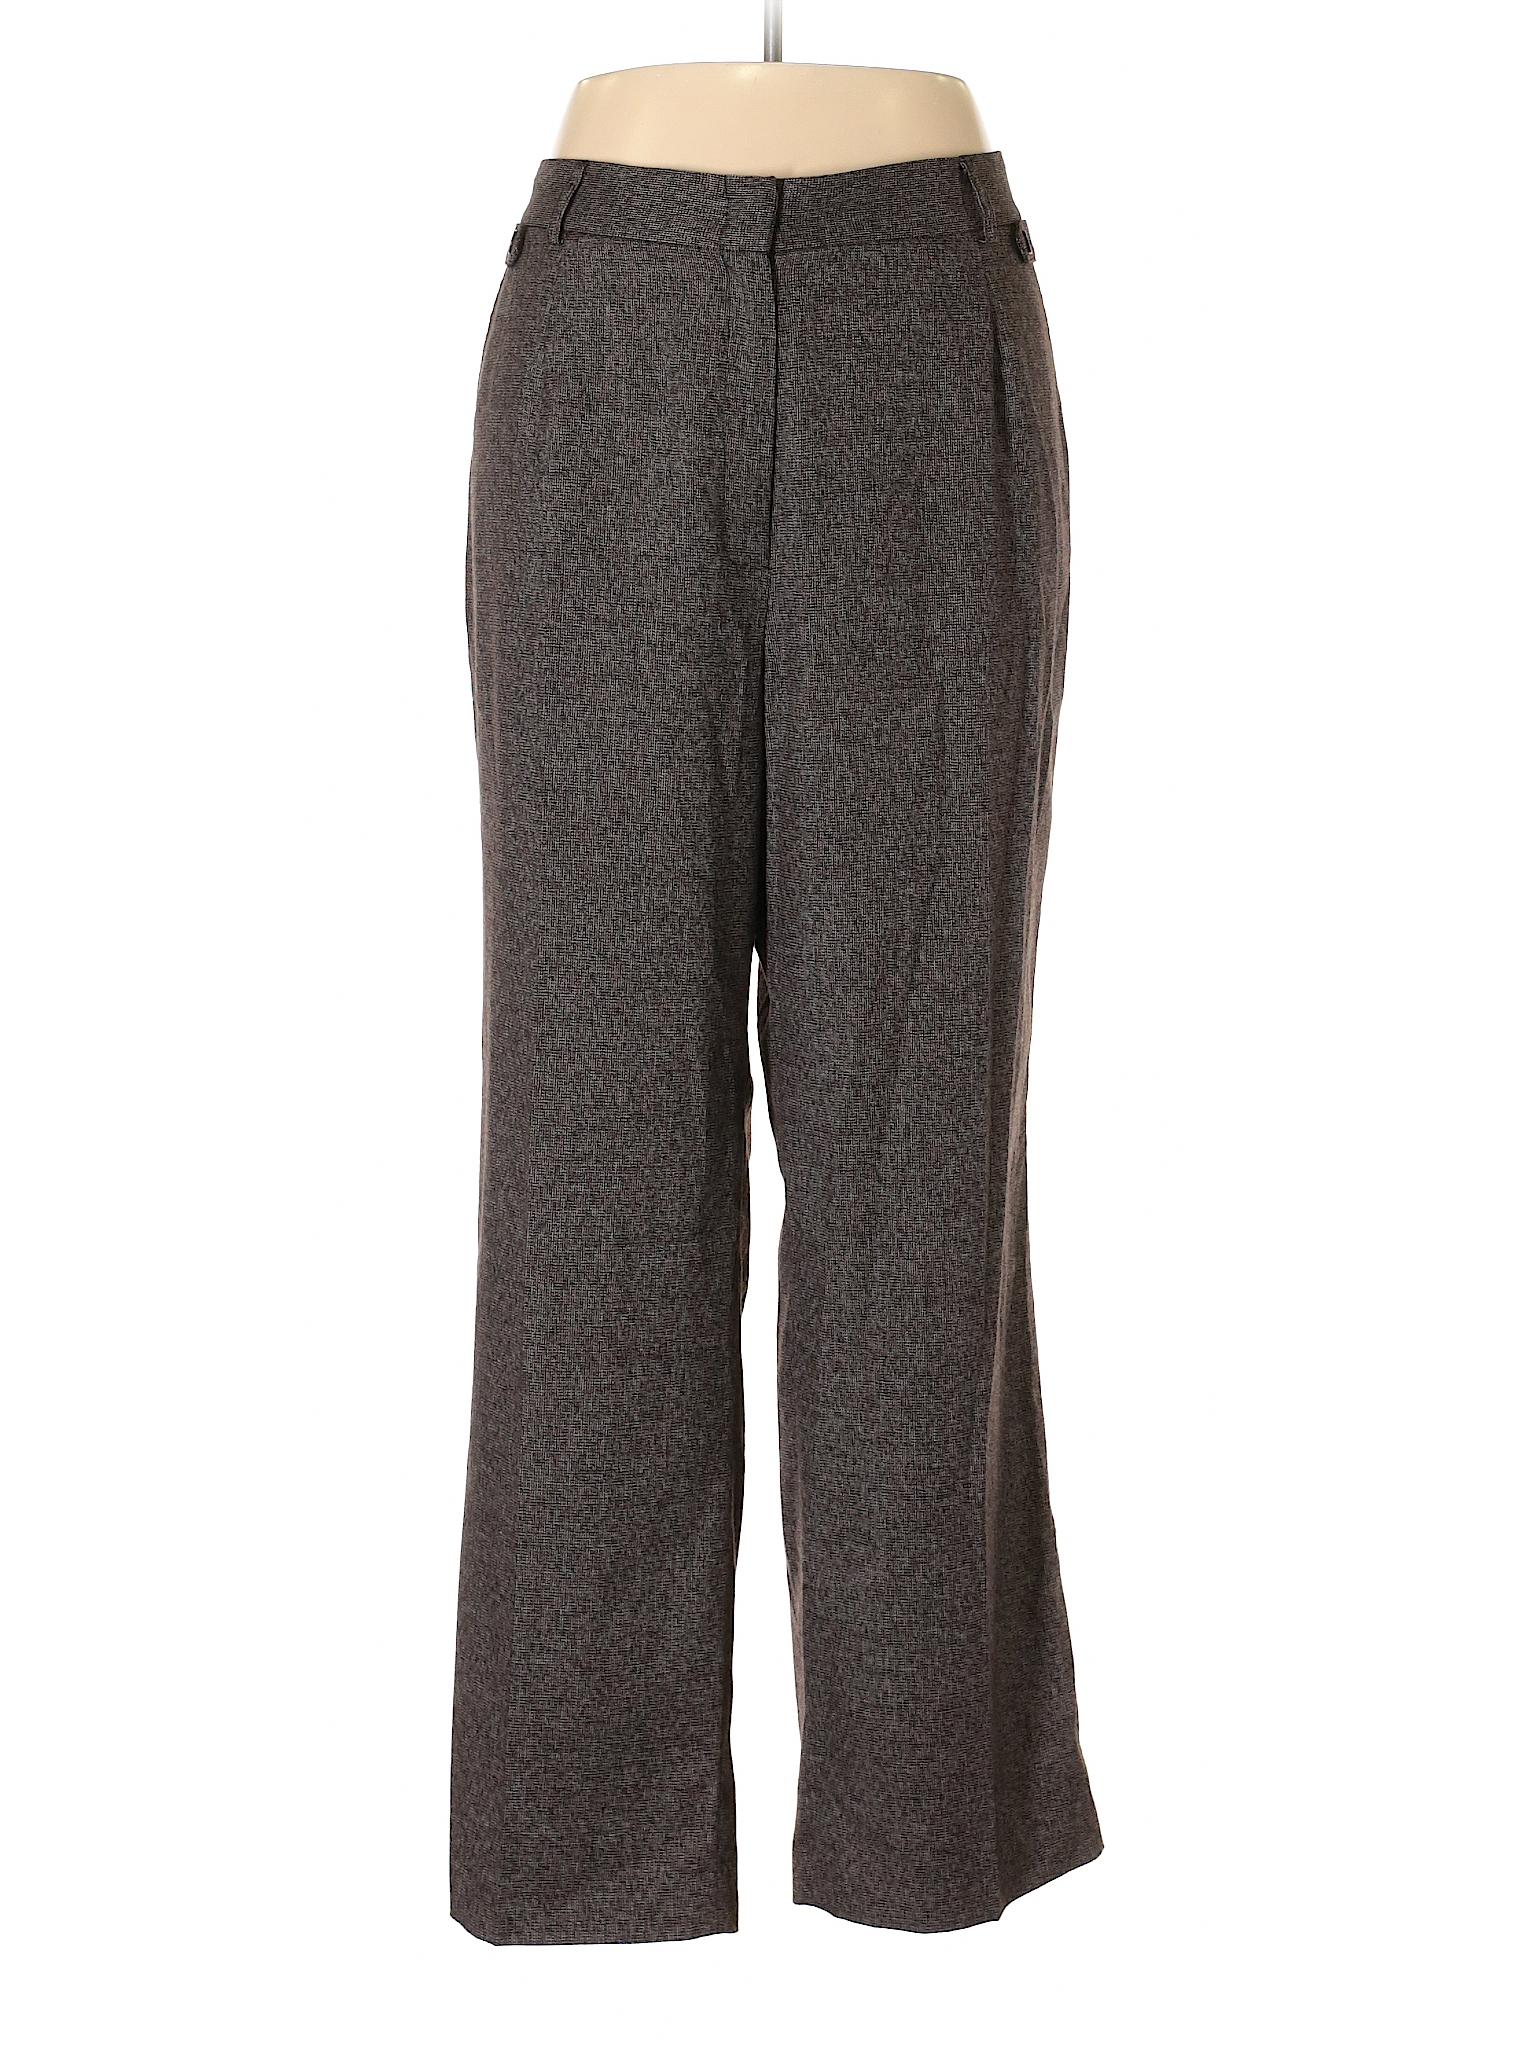 Directions Pants Dress Leisure New Boutique qUFEXw6